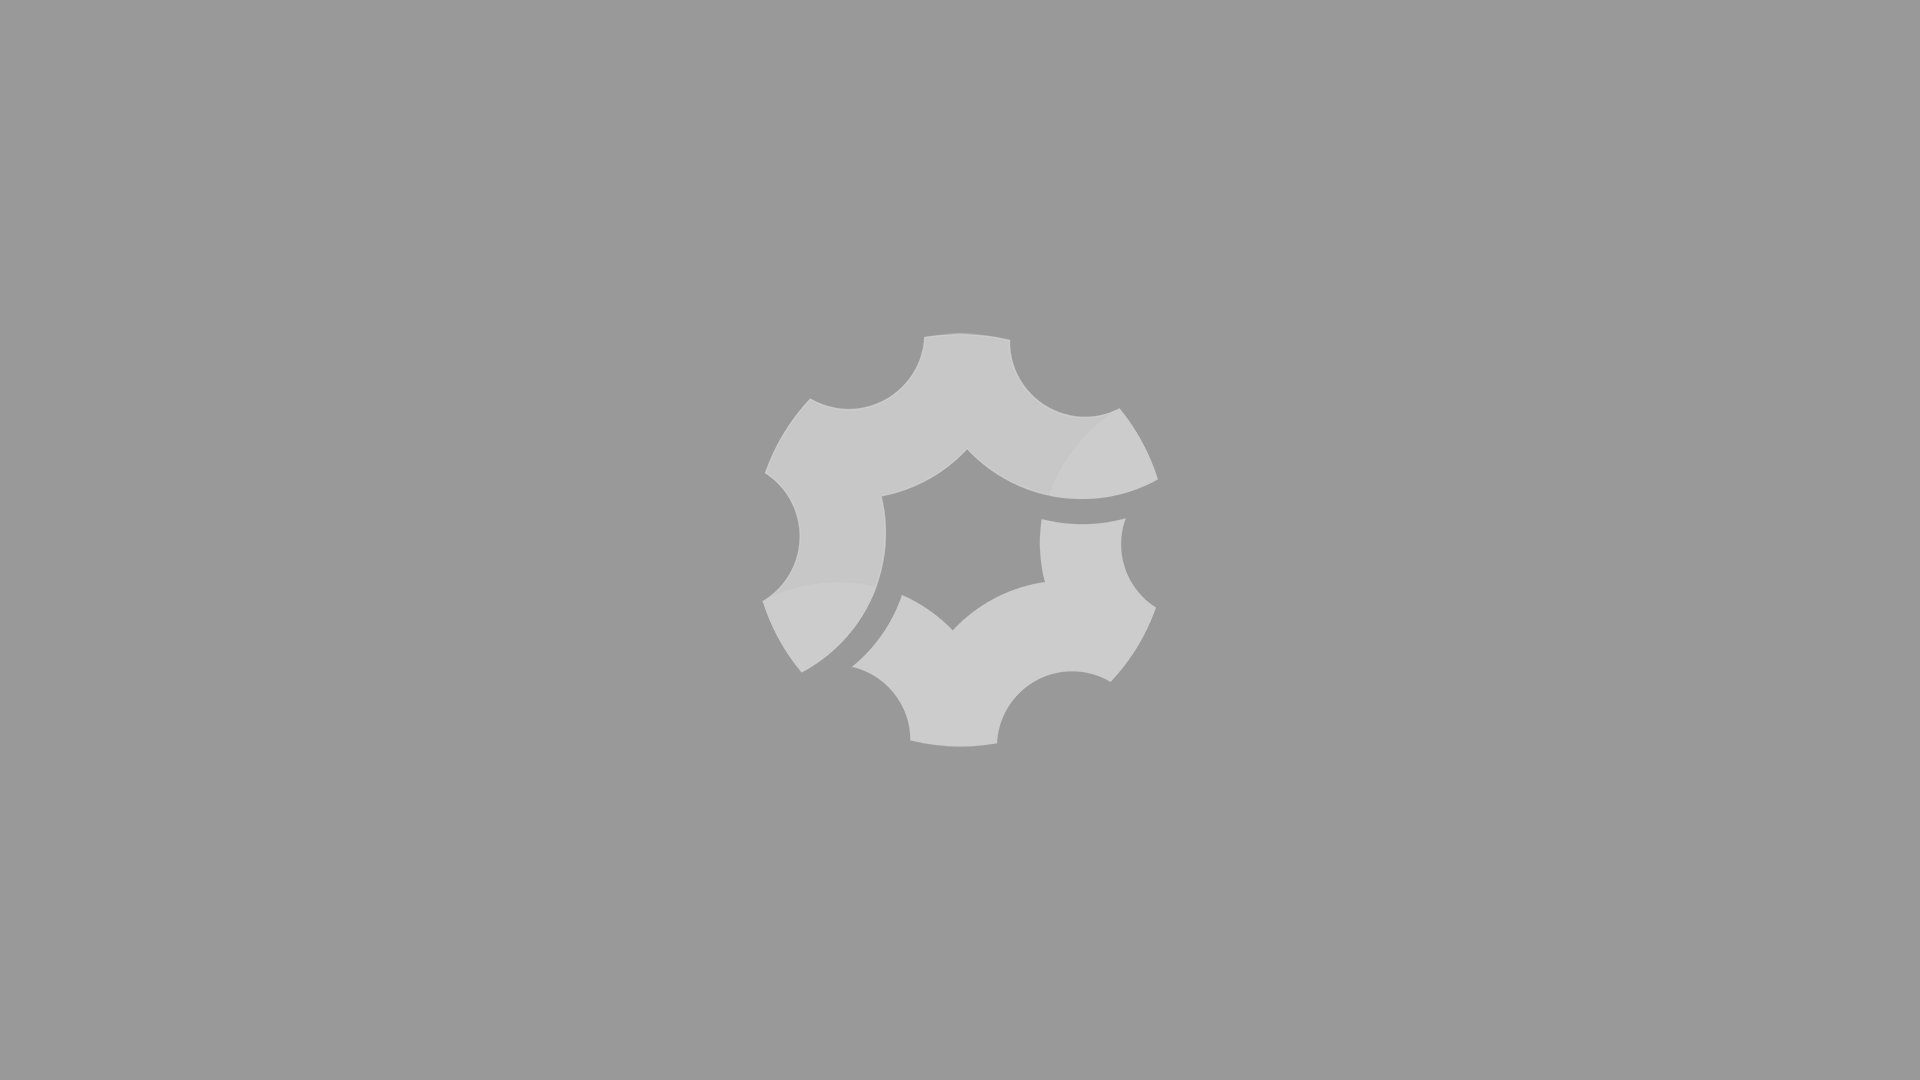 skaterxl_2021-02-21_16-00-57.1.png